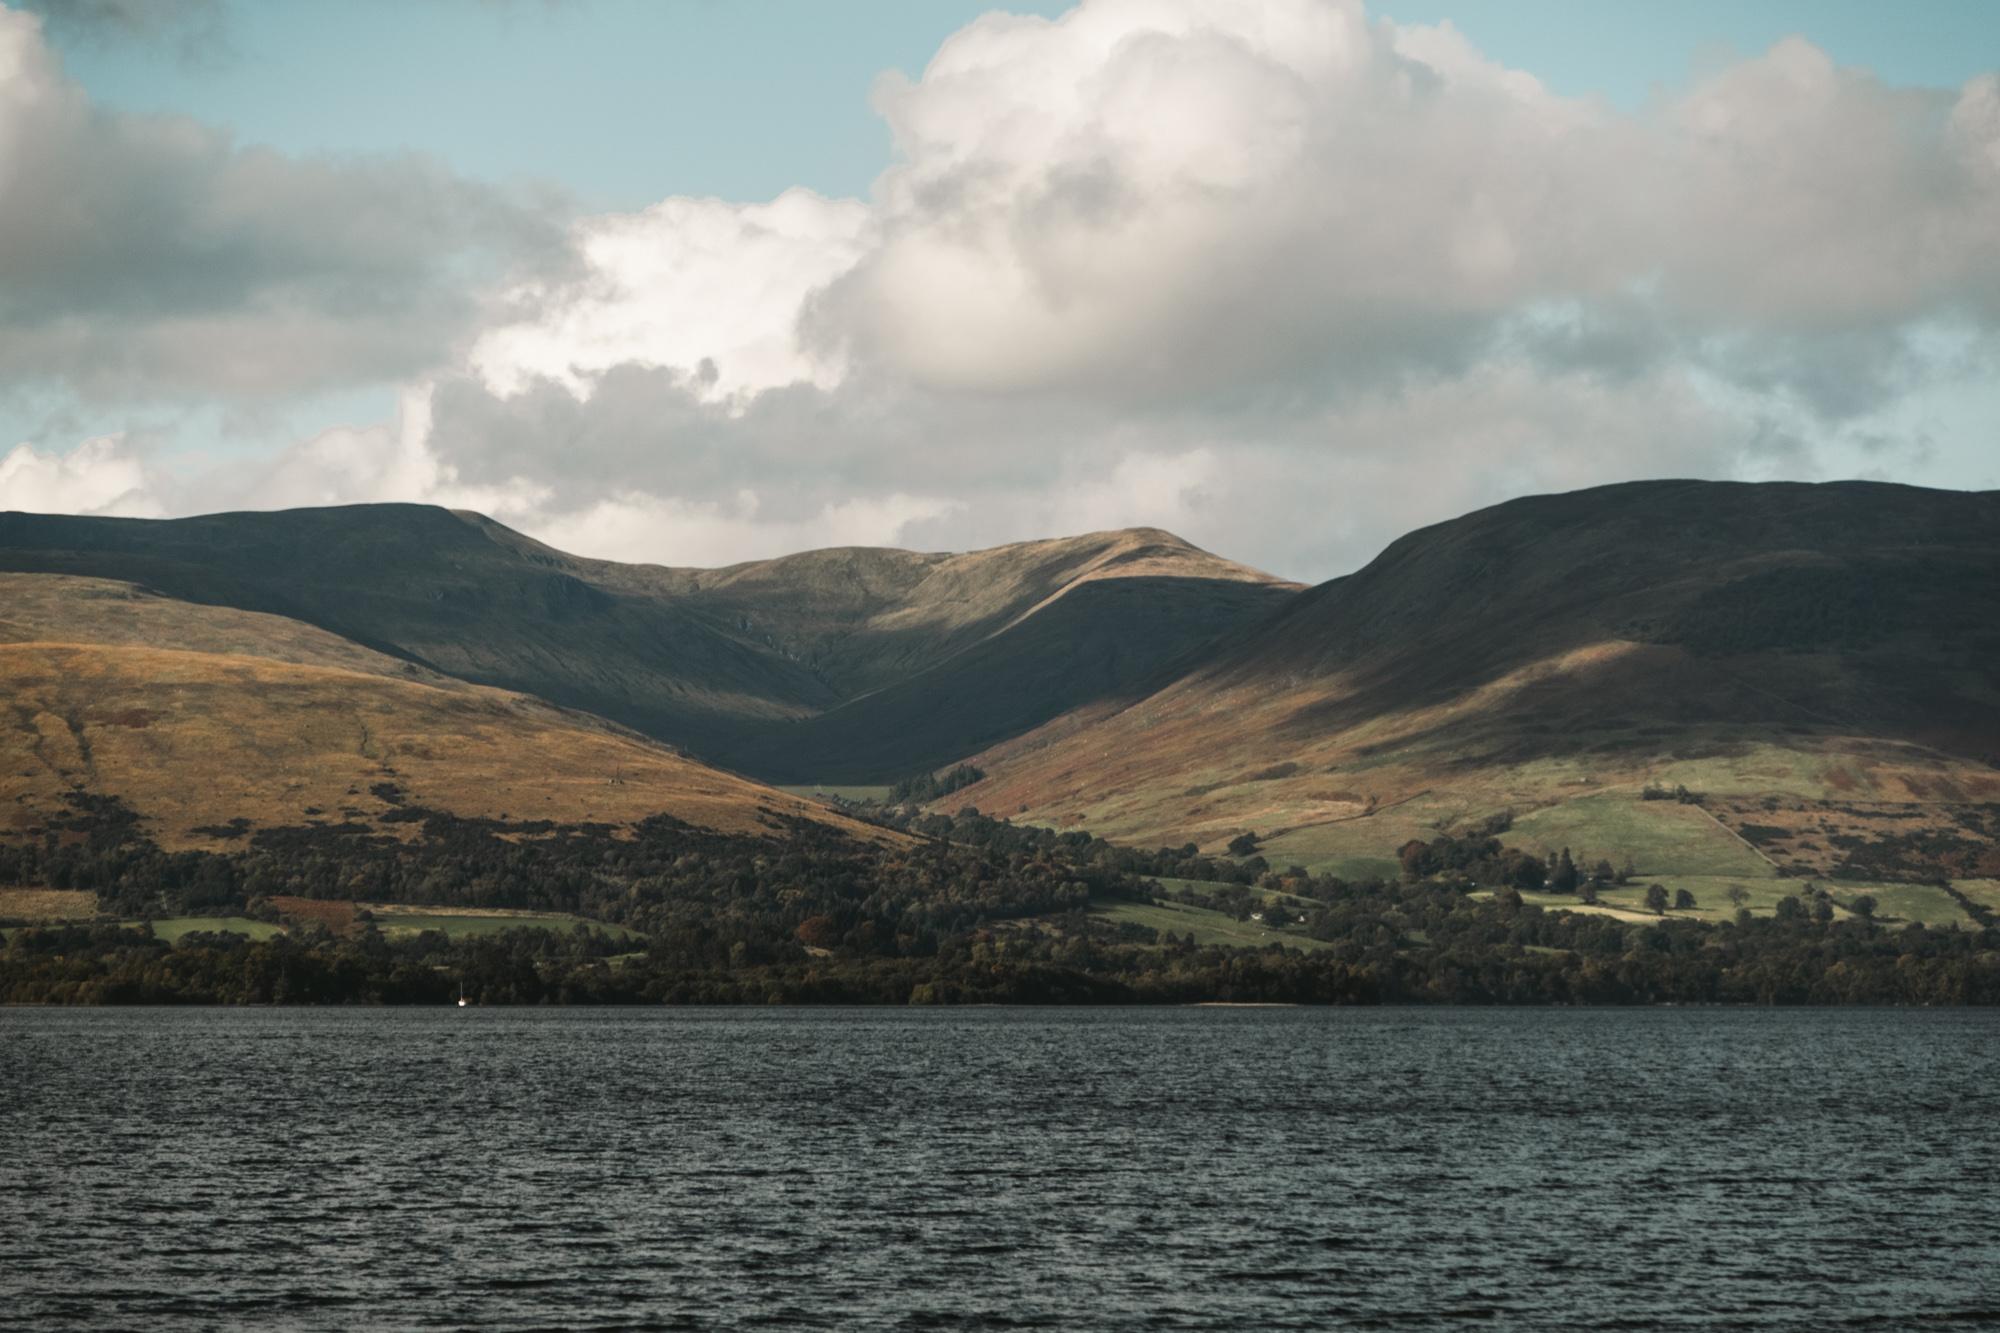 The stunning hills at Loch Lomond